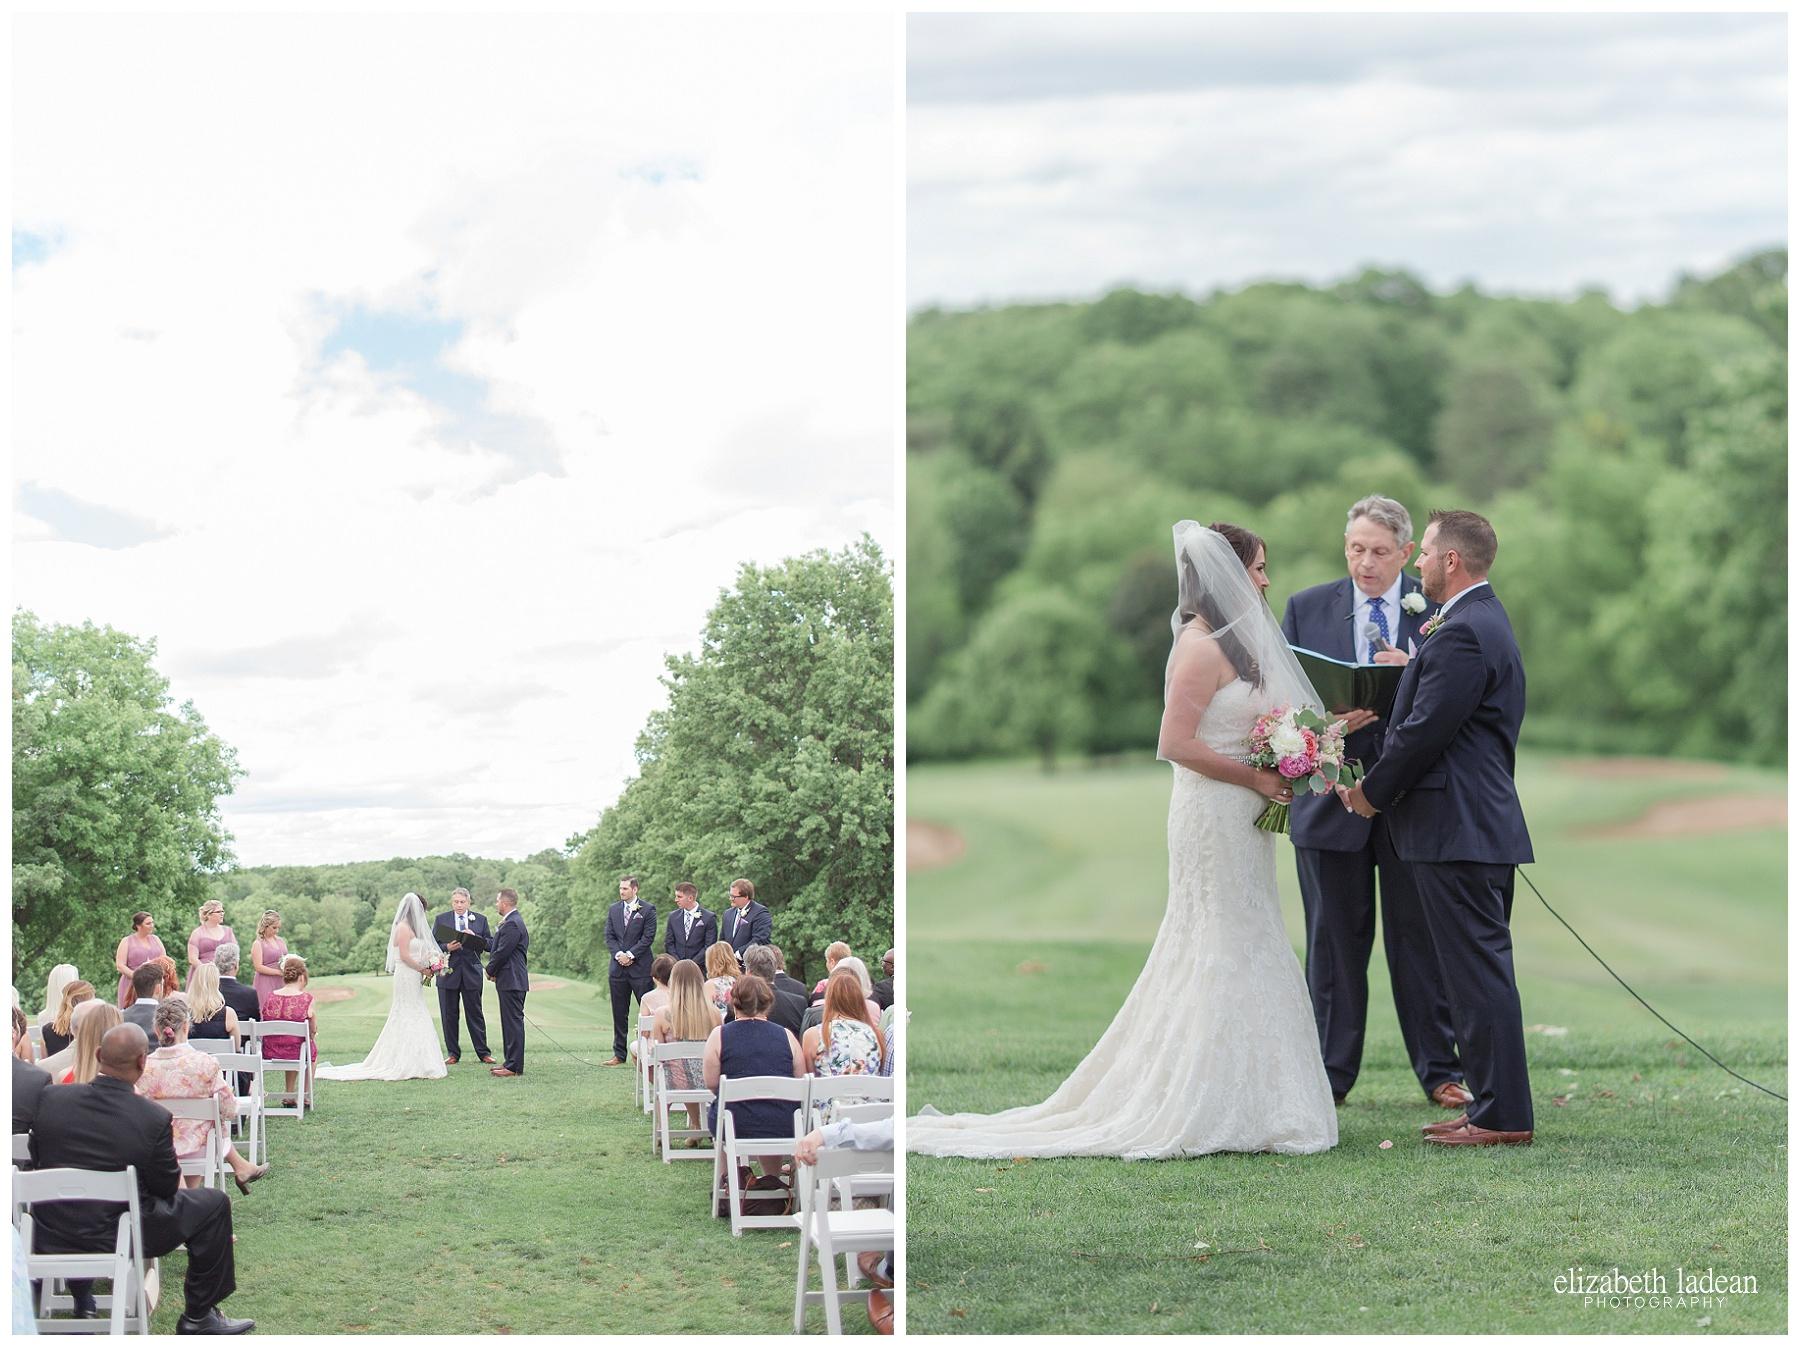 Hillcrest-Country-Club-Kansas-City-Wedding-Photography-E+J-0520-Elizabeth-Ladean-Photography-photo_0840.jpg